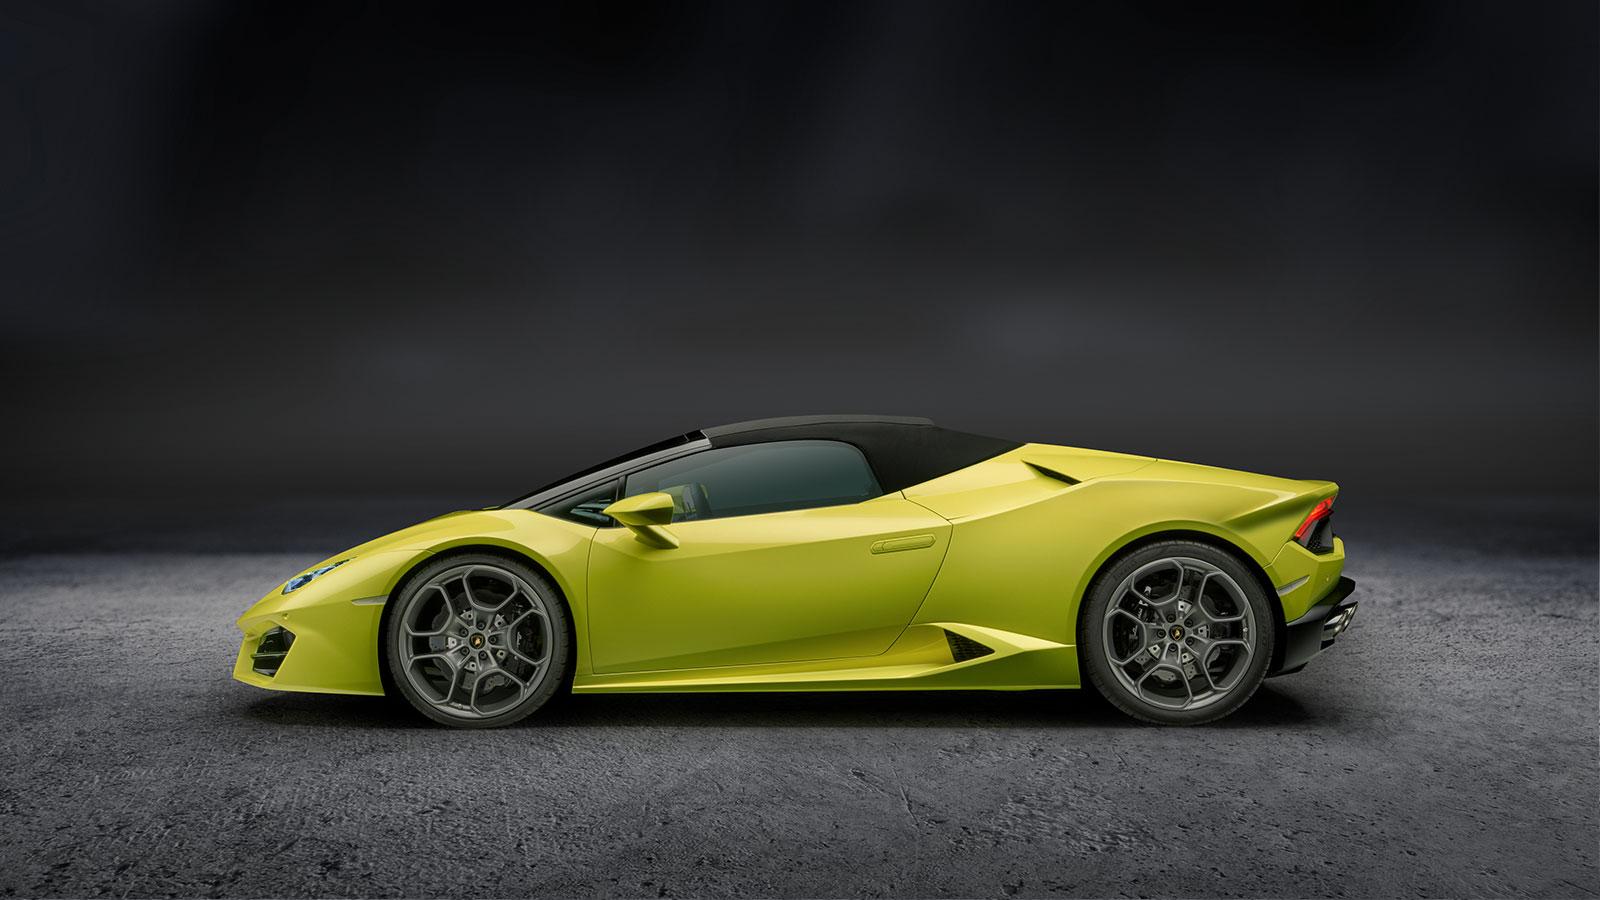 Lamborghini Huracan RWD Spyder - Breathtaking Technology image 11